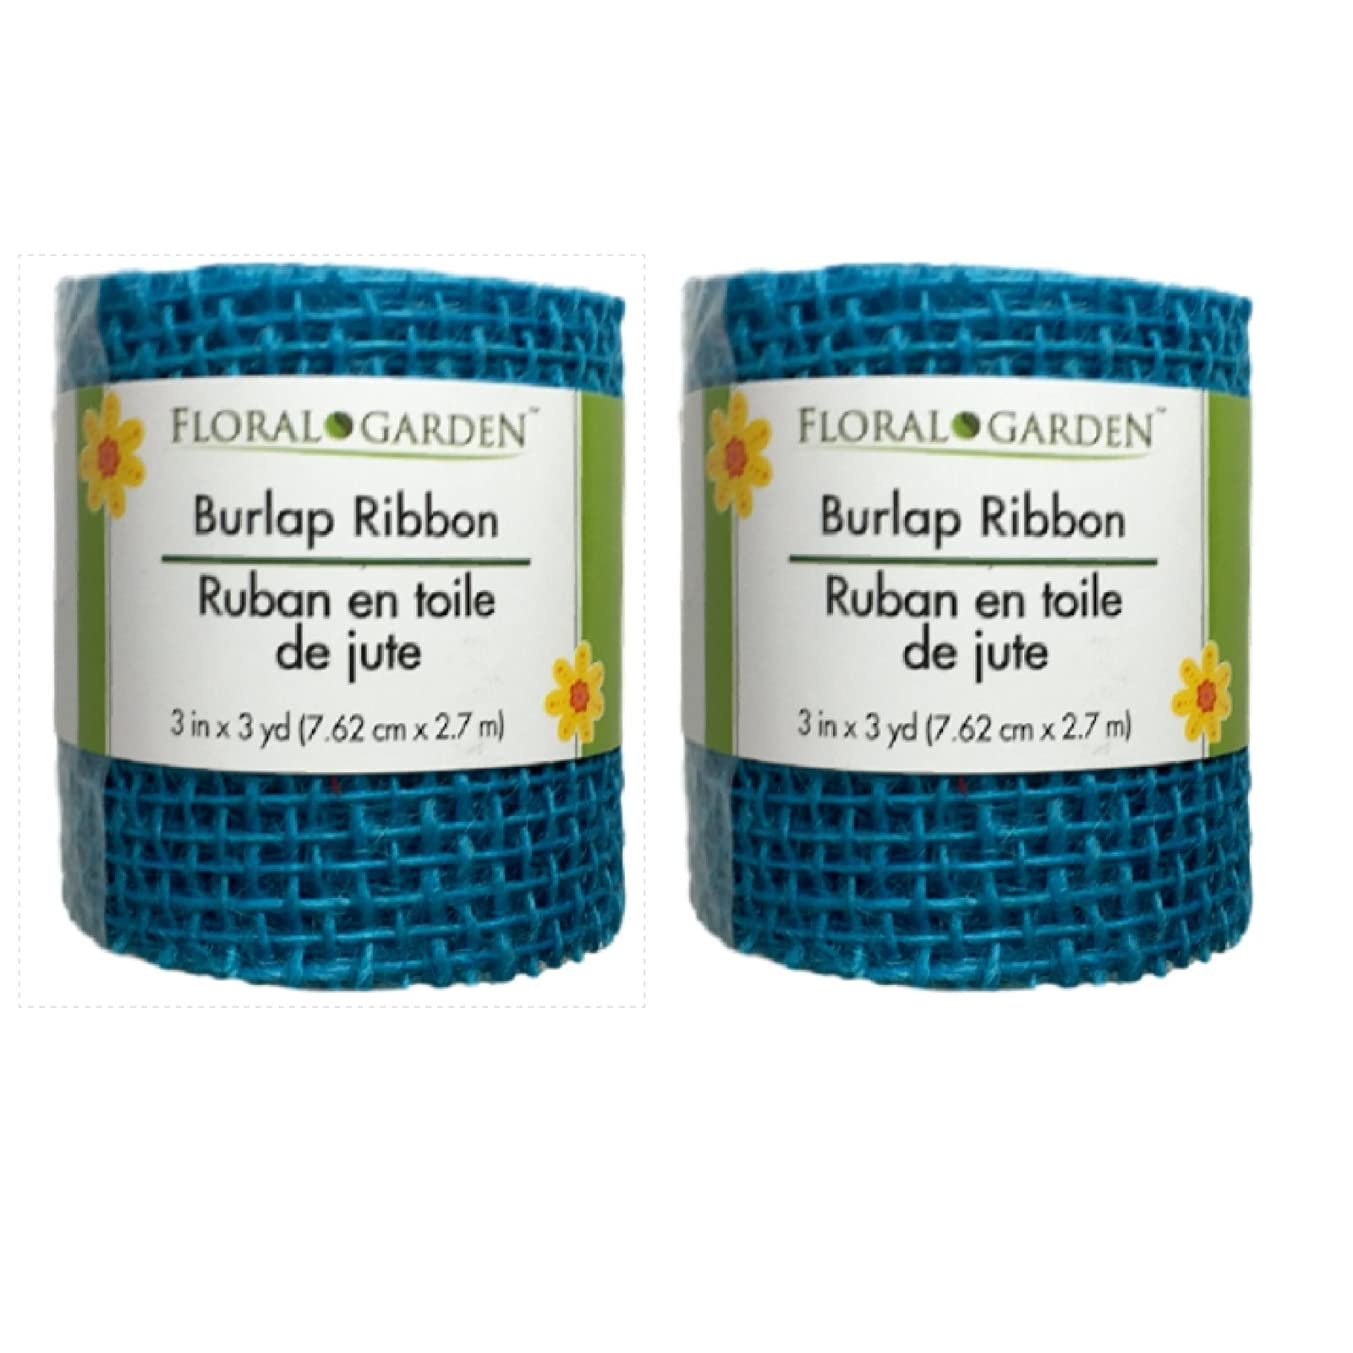 Floral Garden Burlap Ribbon Set of 2 (2 Rolls, Blue)